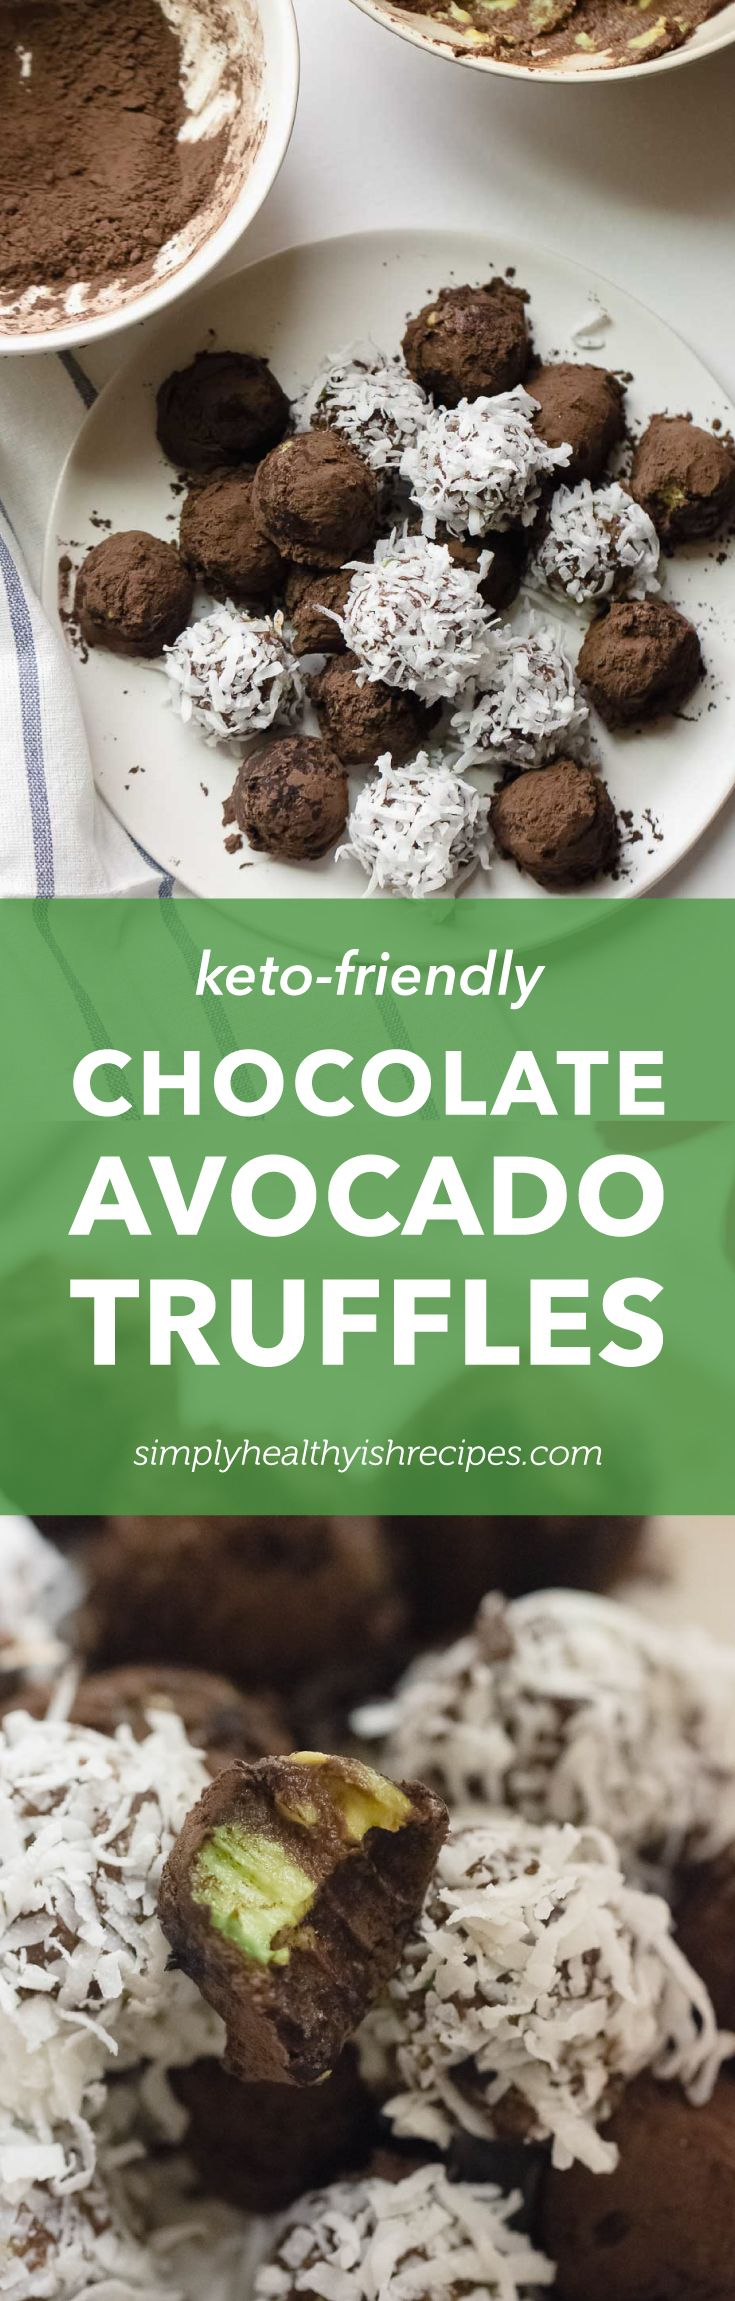 Chocolate avocado truffles for a ketofriendly treat that